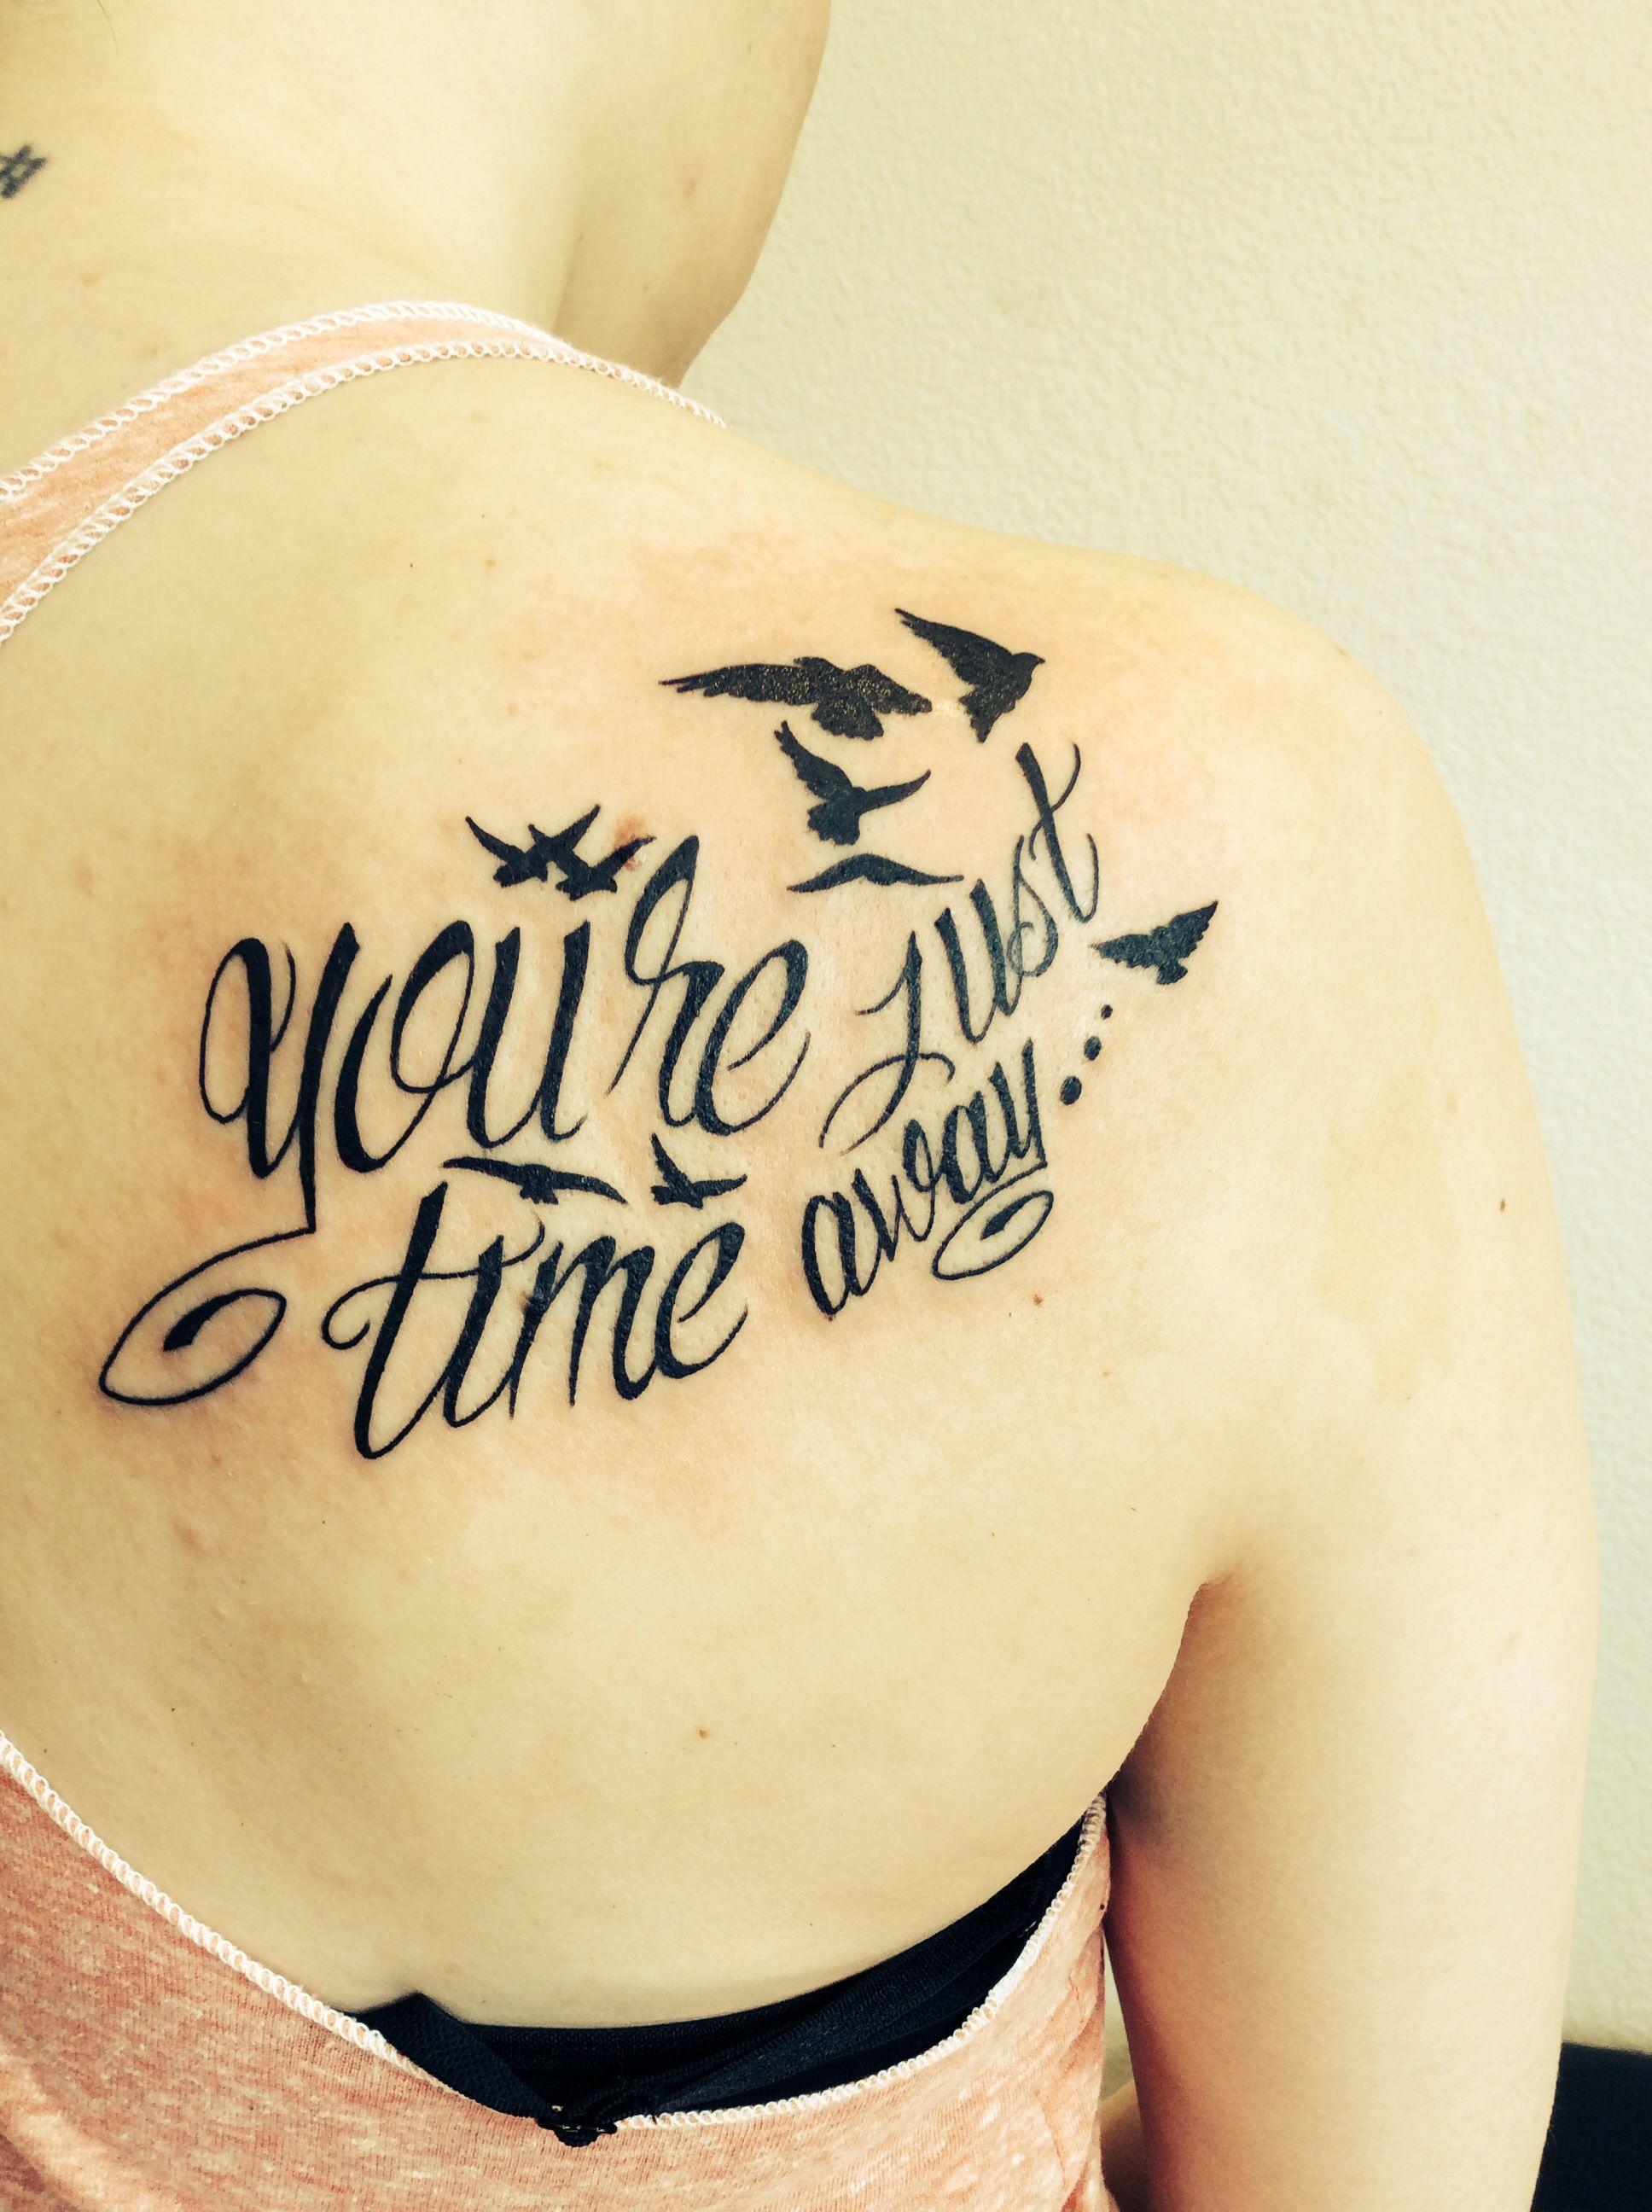 Italian tattoo words and phrases mixworld - Tattoo By Jojo Miller Dynamic Ink Eternal Ink Tattoo Placement Tattoo Ideas